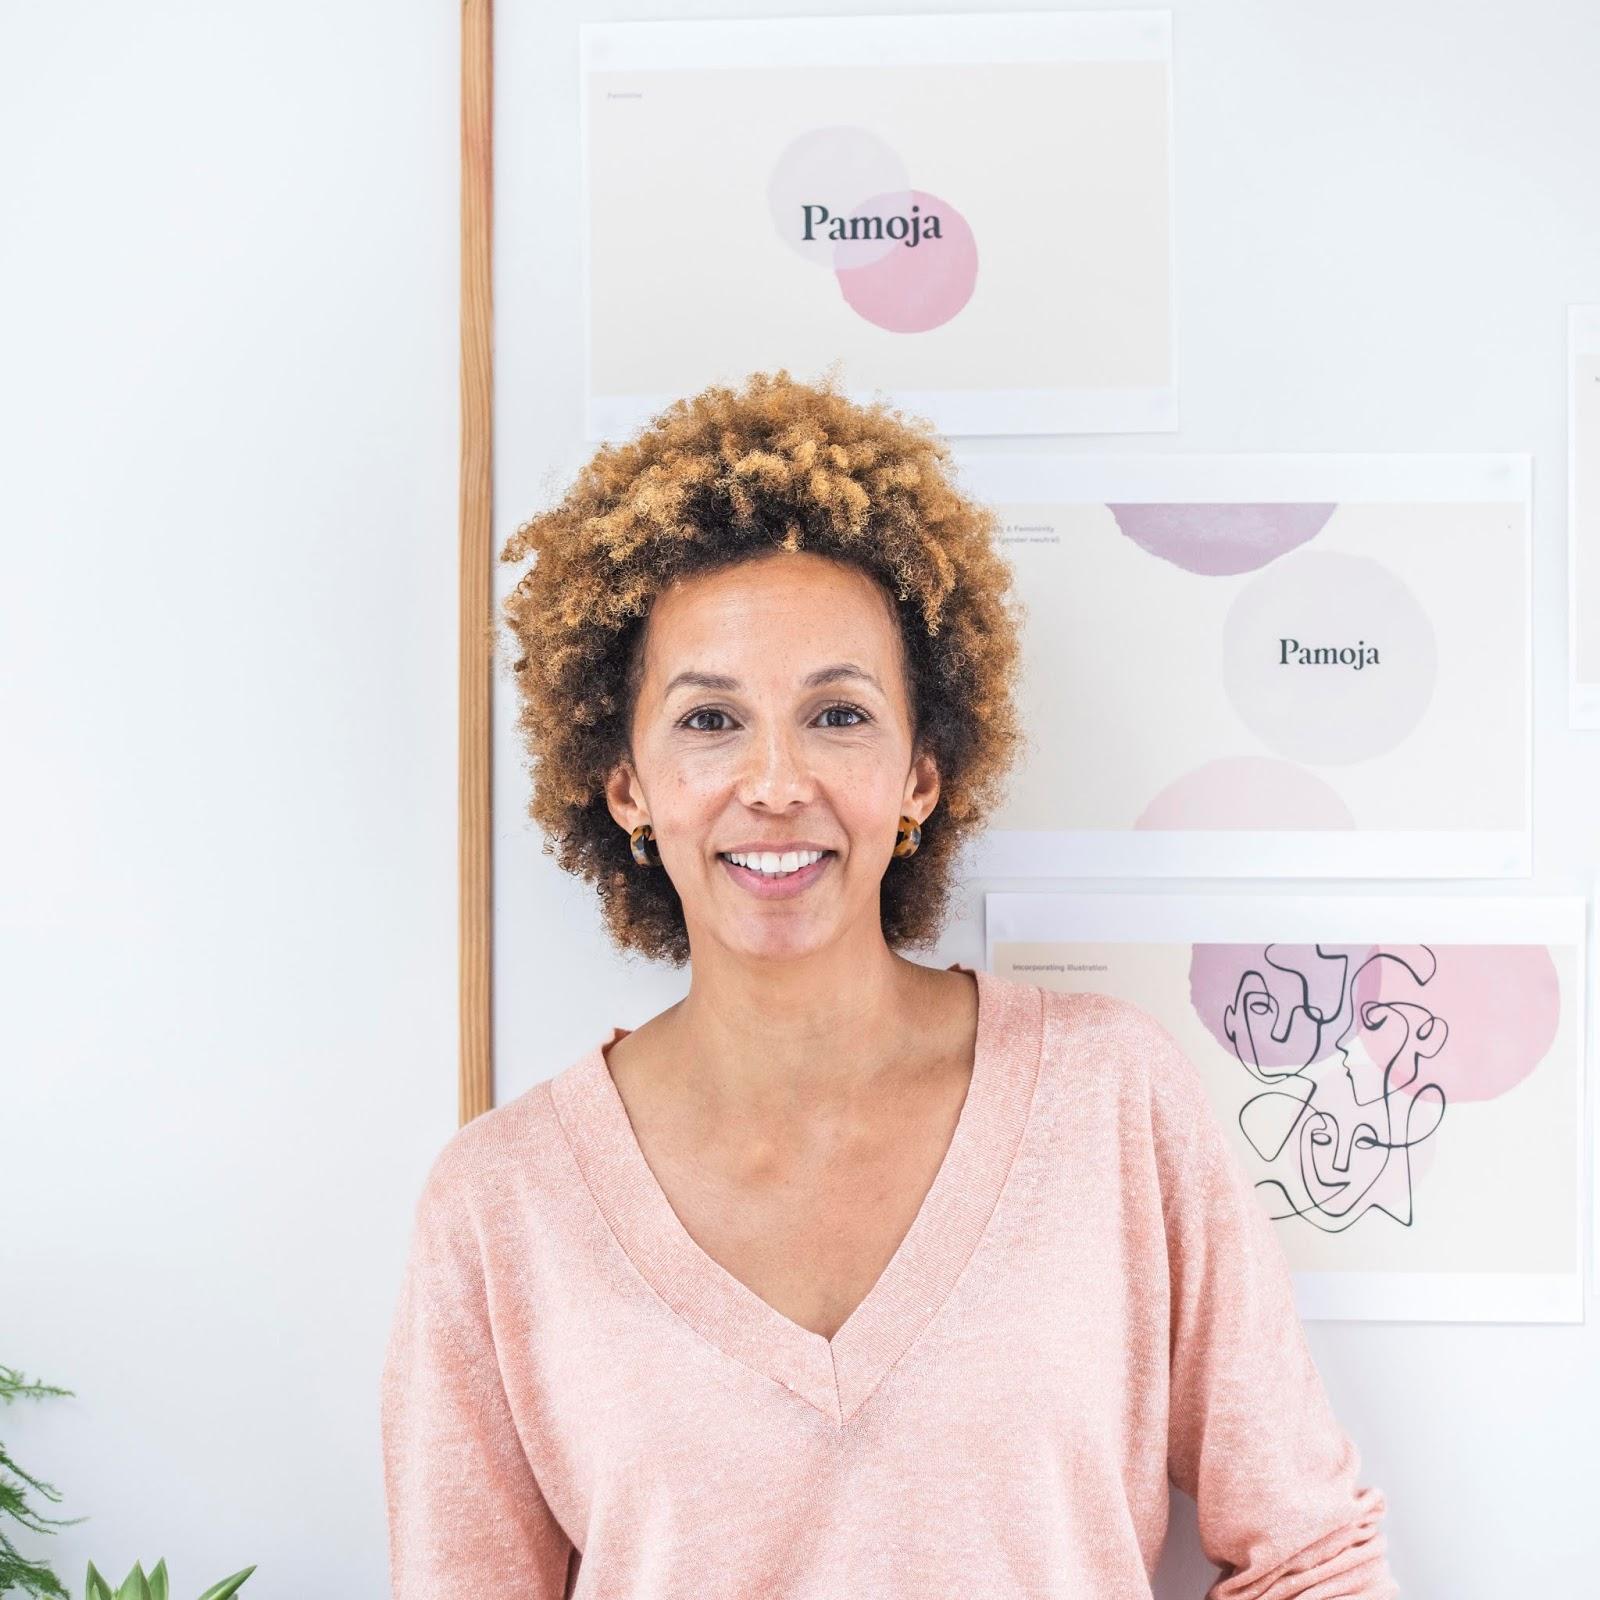 Sarah founder of Pamoja Skincare